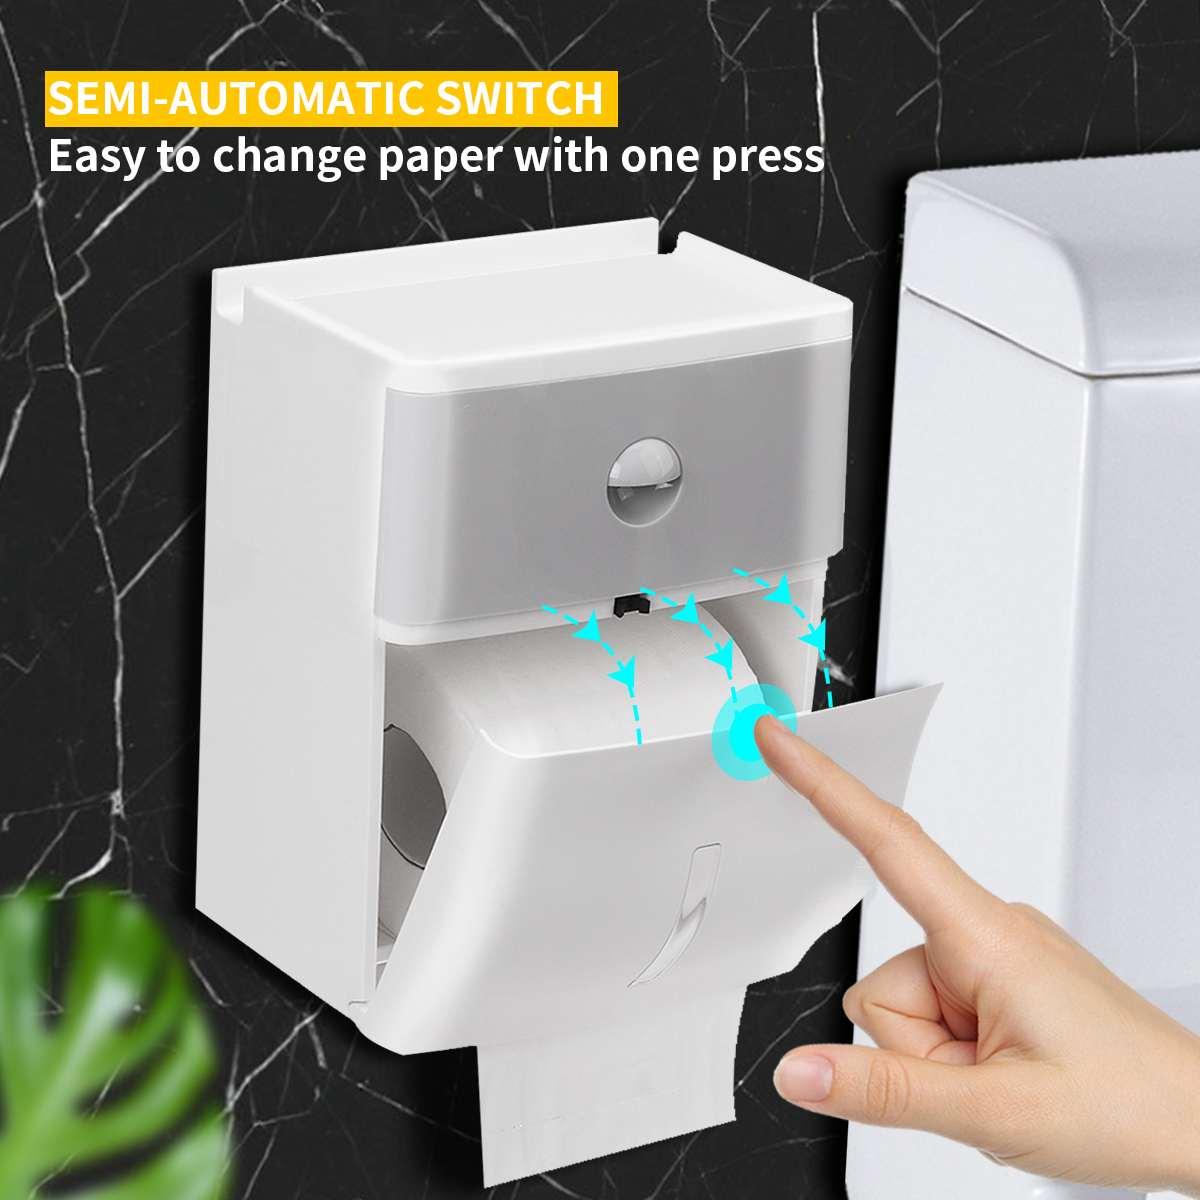 Washroom Paper Towel Dispenser Wall Mounted Paper Holder Waterproof Home Toilet Holder Organizer Bathroom Fixture Commercial Use